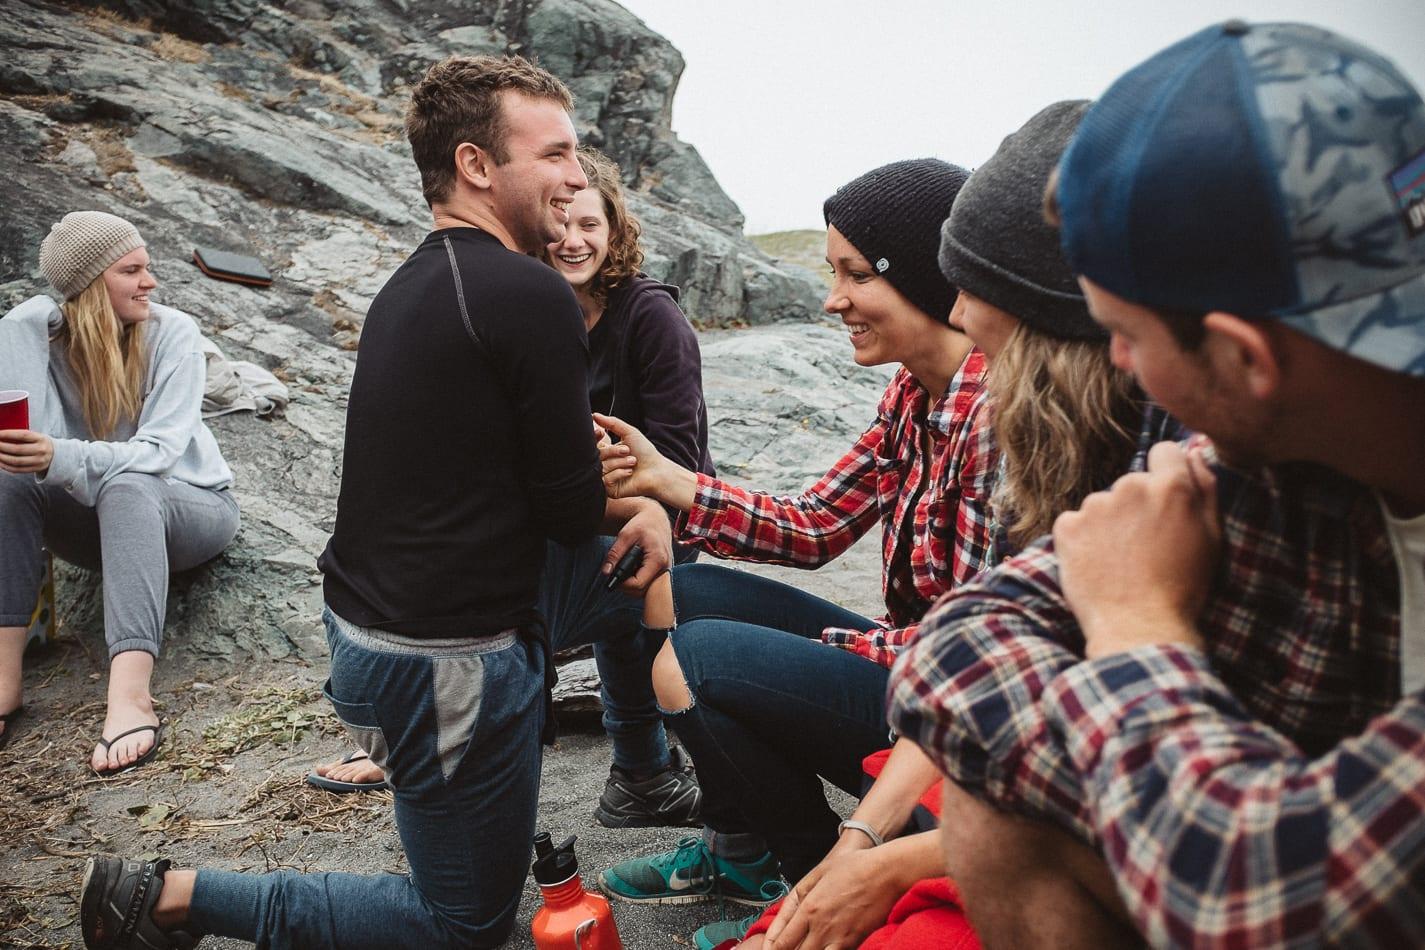 patricks-point-beach-camping-california-adventure-photographer-3